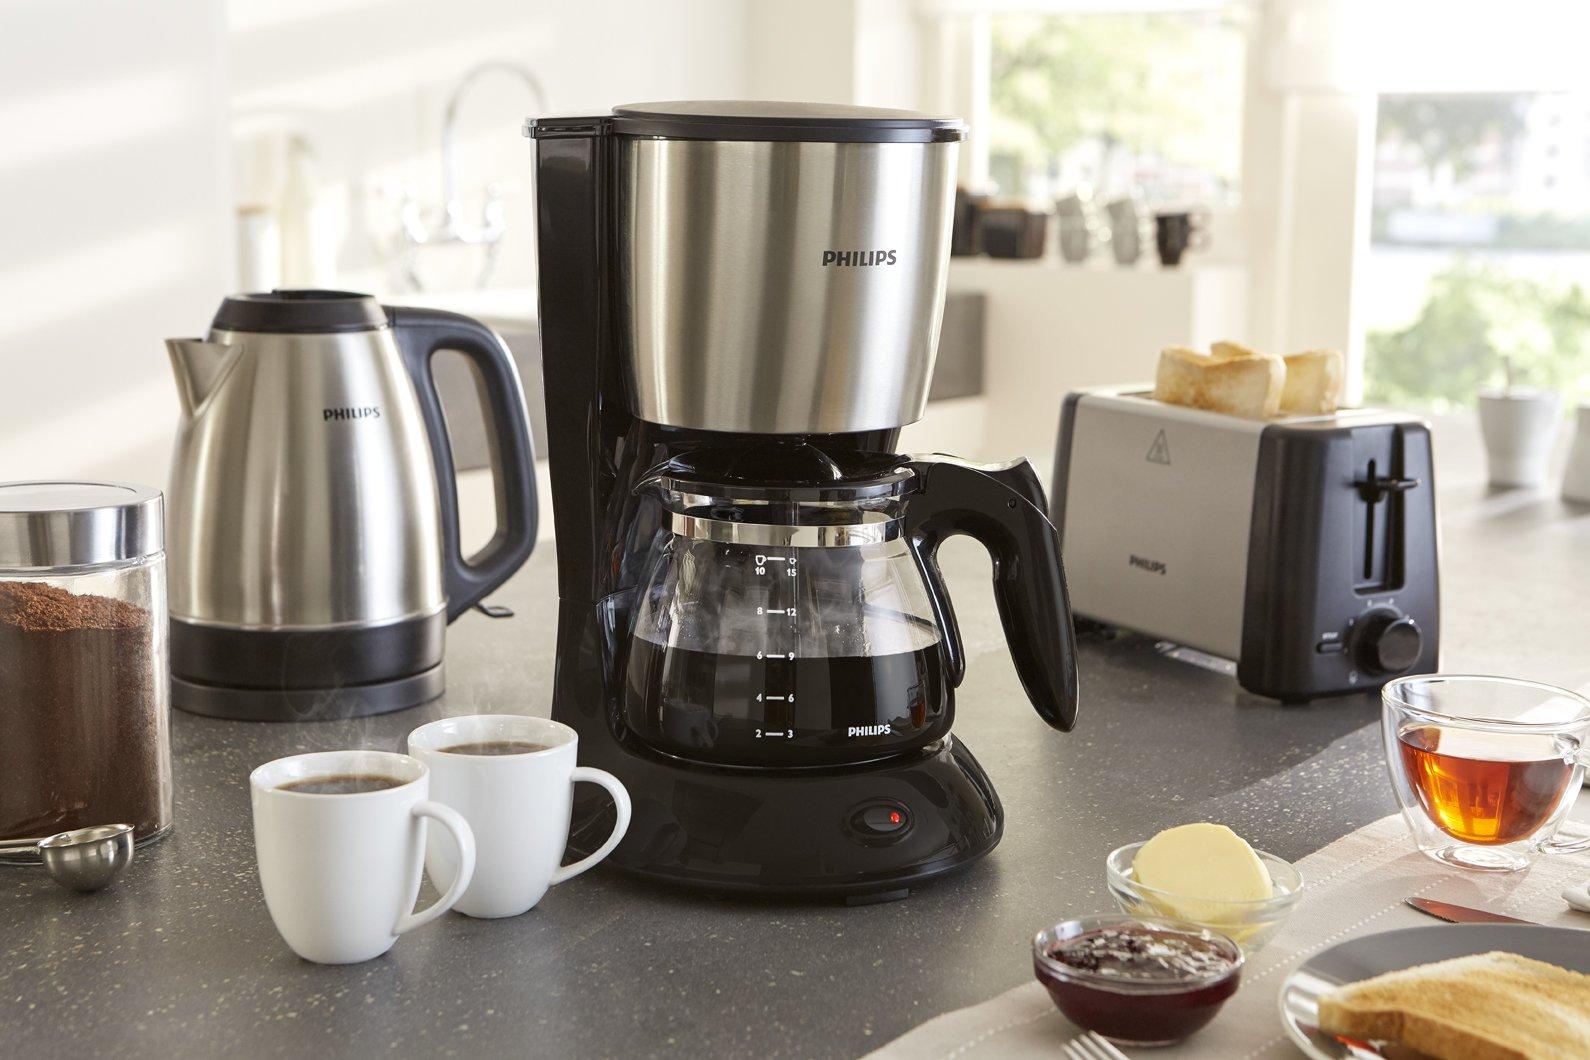 Philips-HD746221-Daily-Filter-Kaffeemaschine